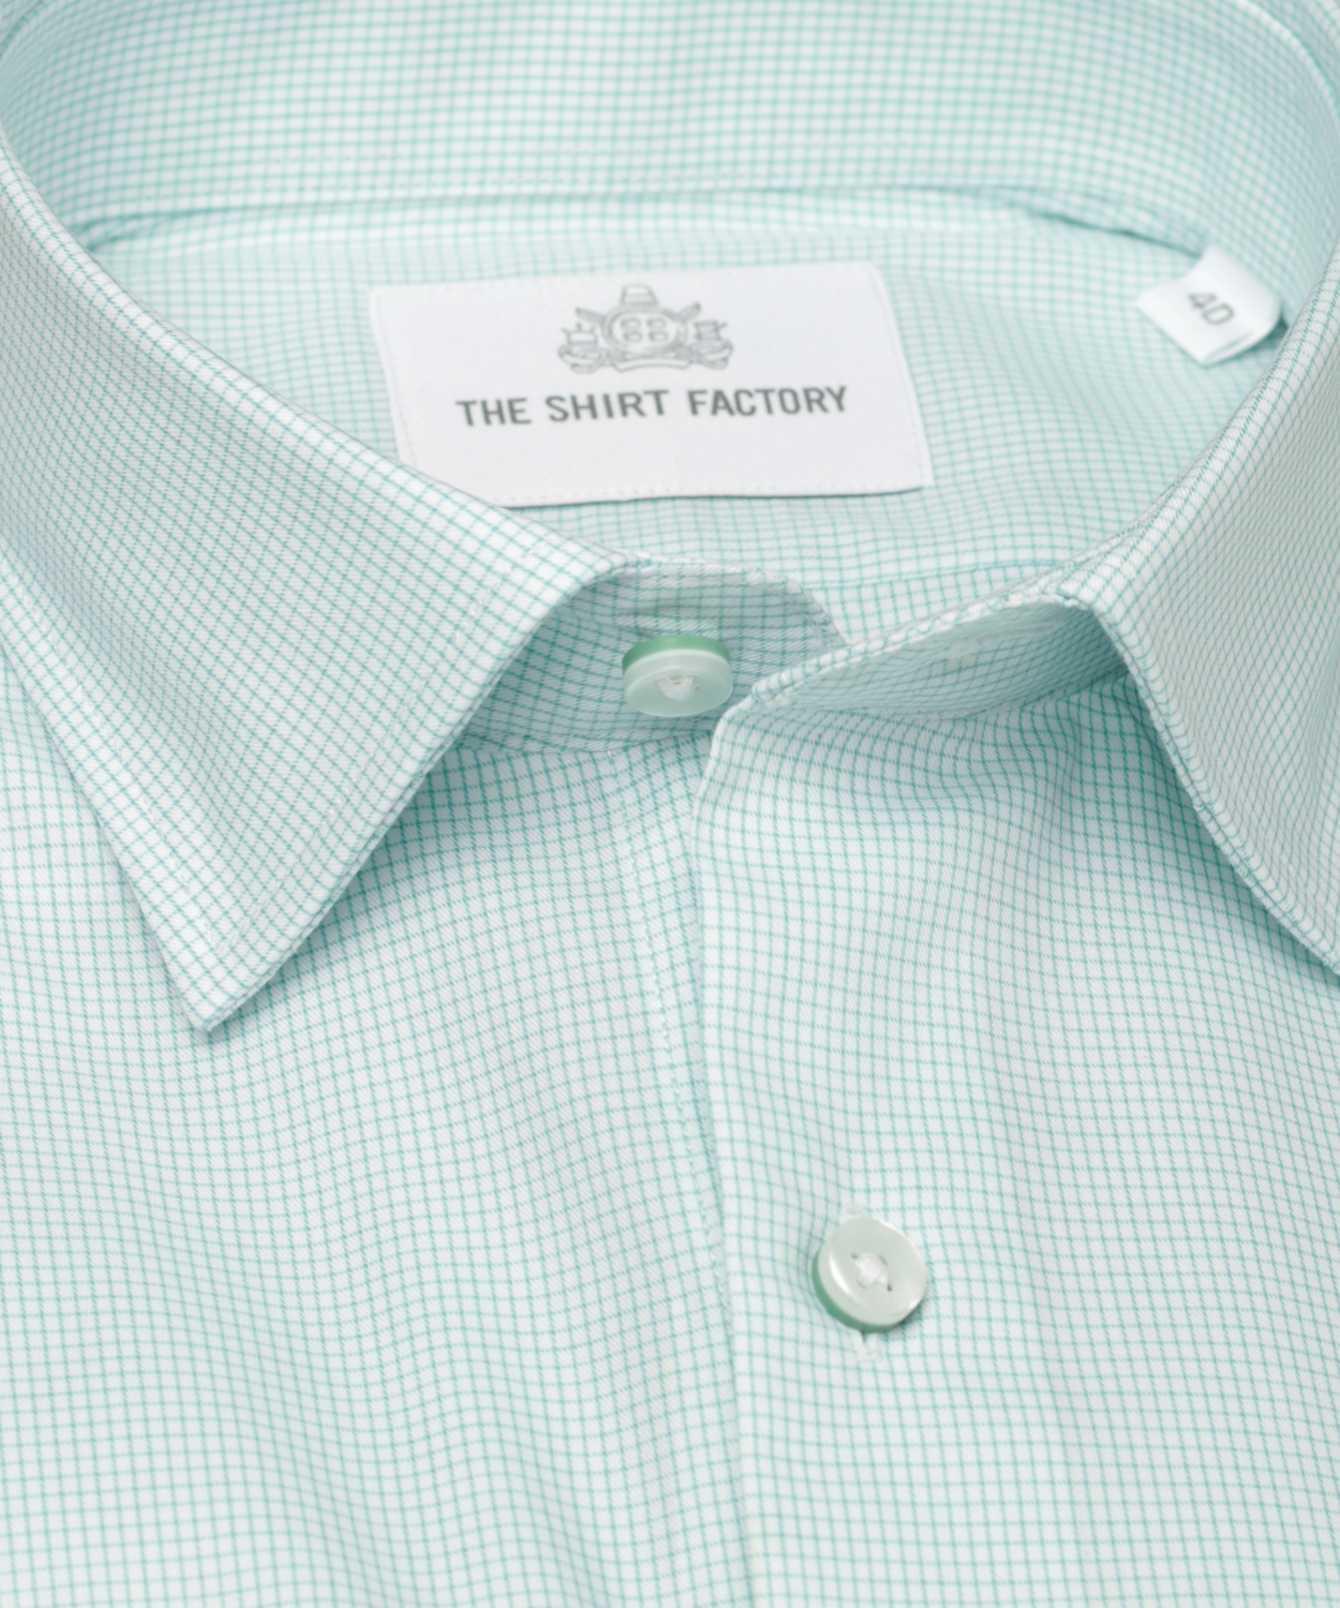 Skjorta Dublin Strykfri Grön The Shirt Factory